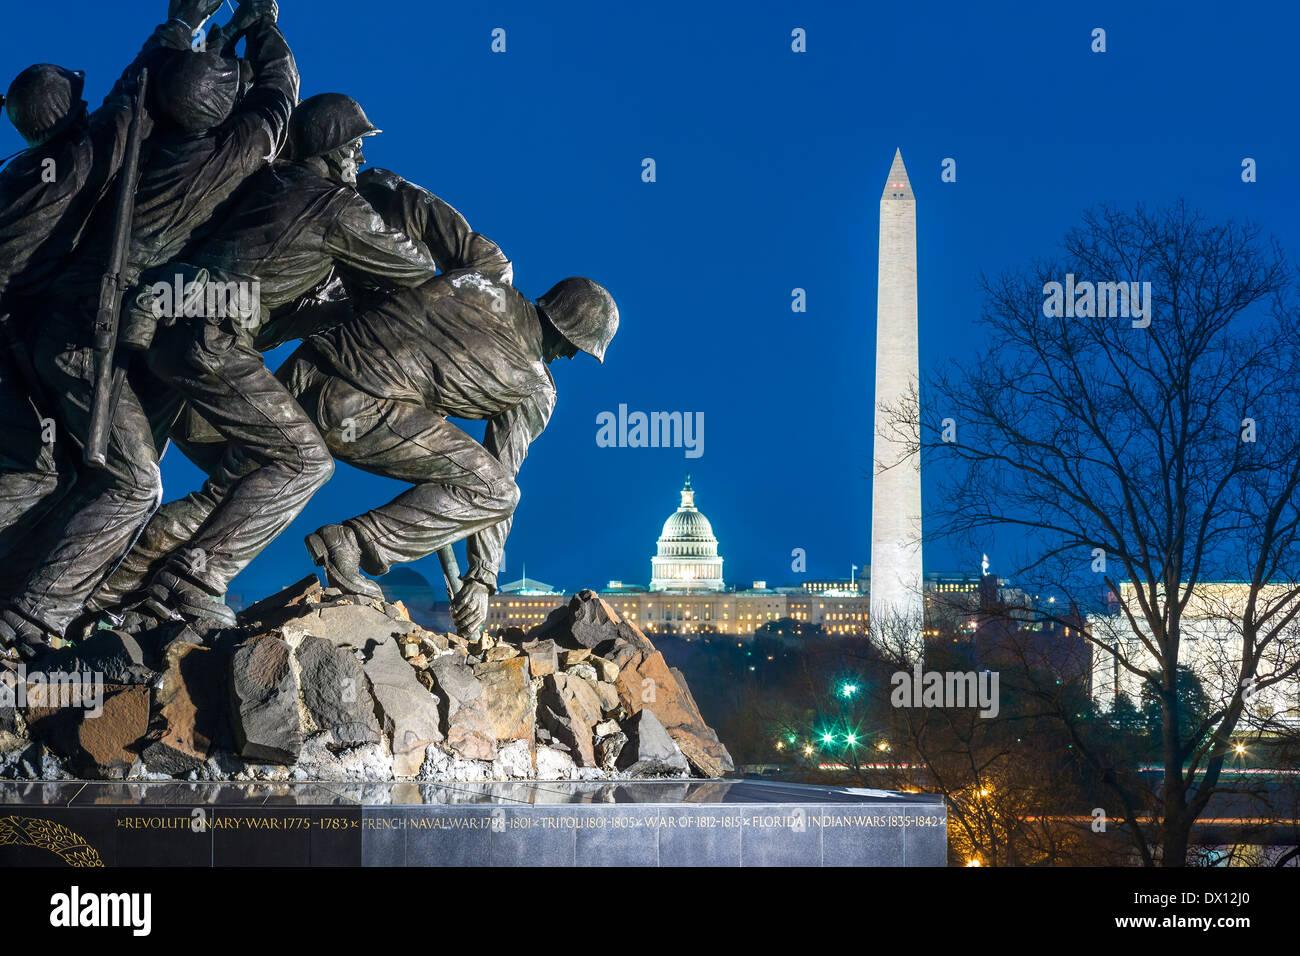 Arlington US Marine Corps War Memorial Washington DC skyline Washington Monument US Capitol Building Lincoln Memorial Mall - Stock Image